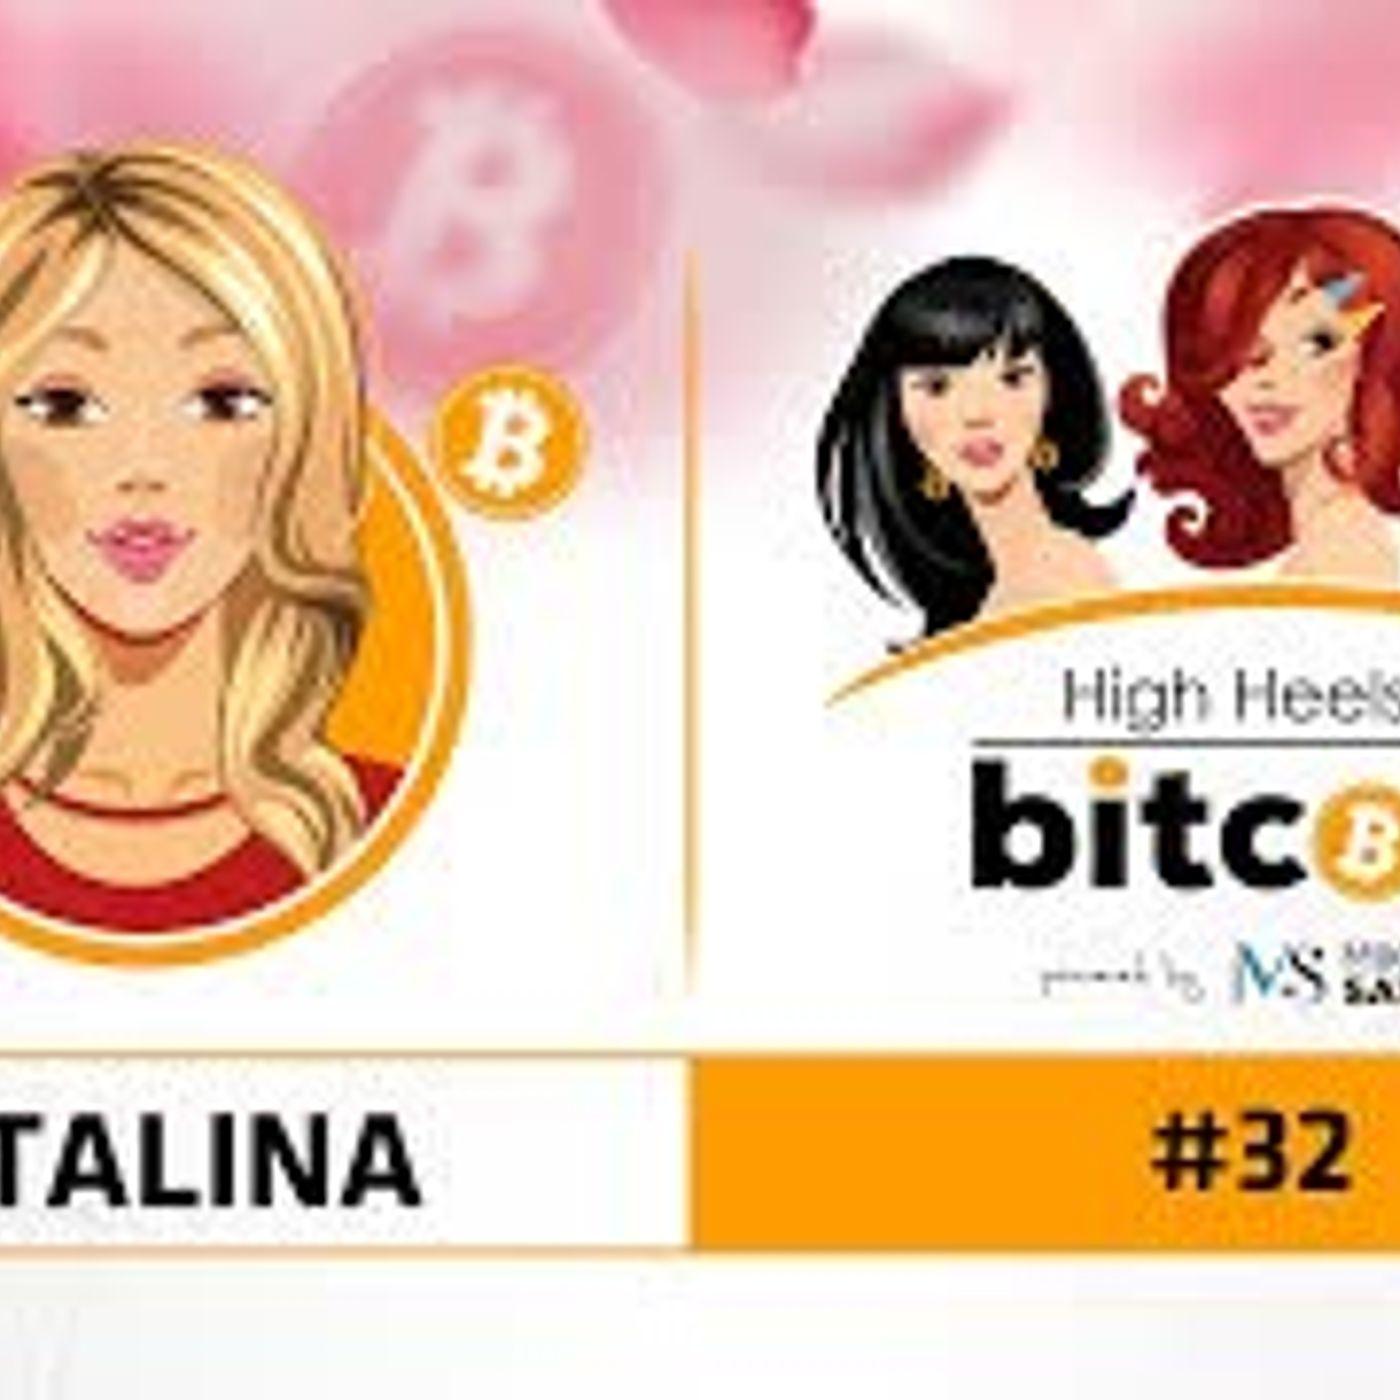 High Heels of Bitcoin #32 | Catalina